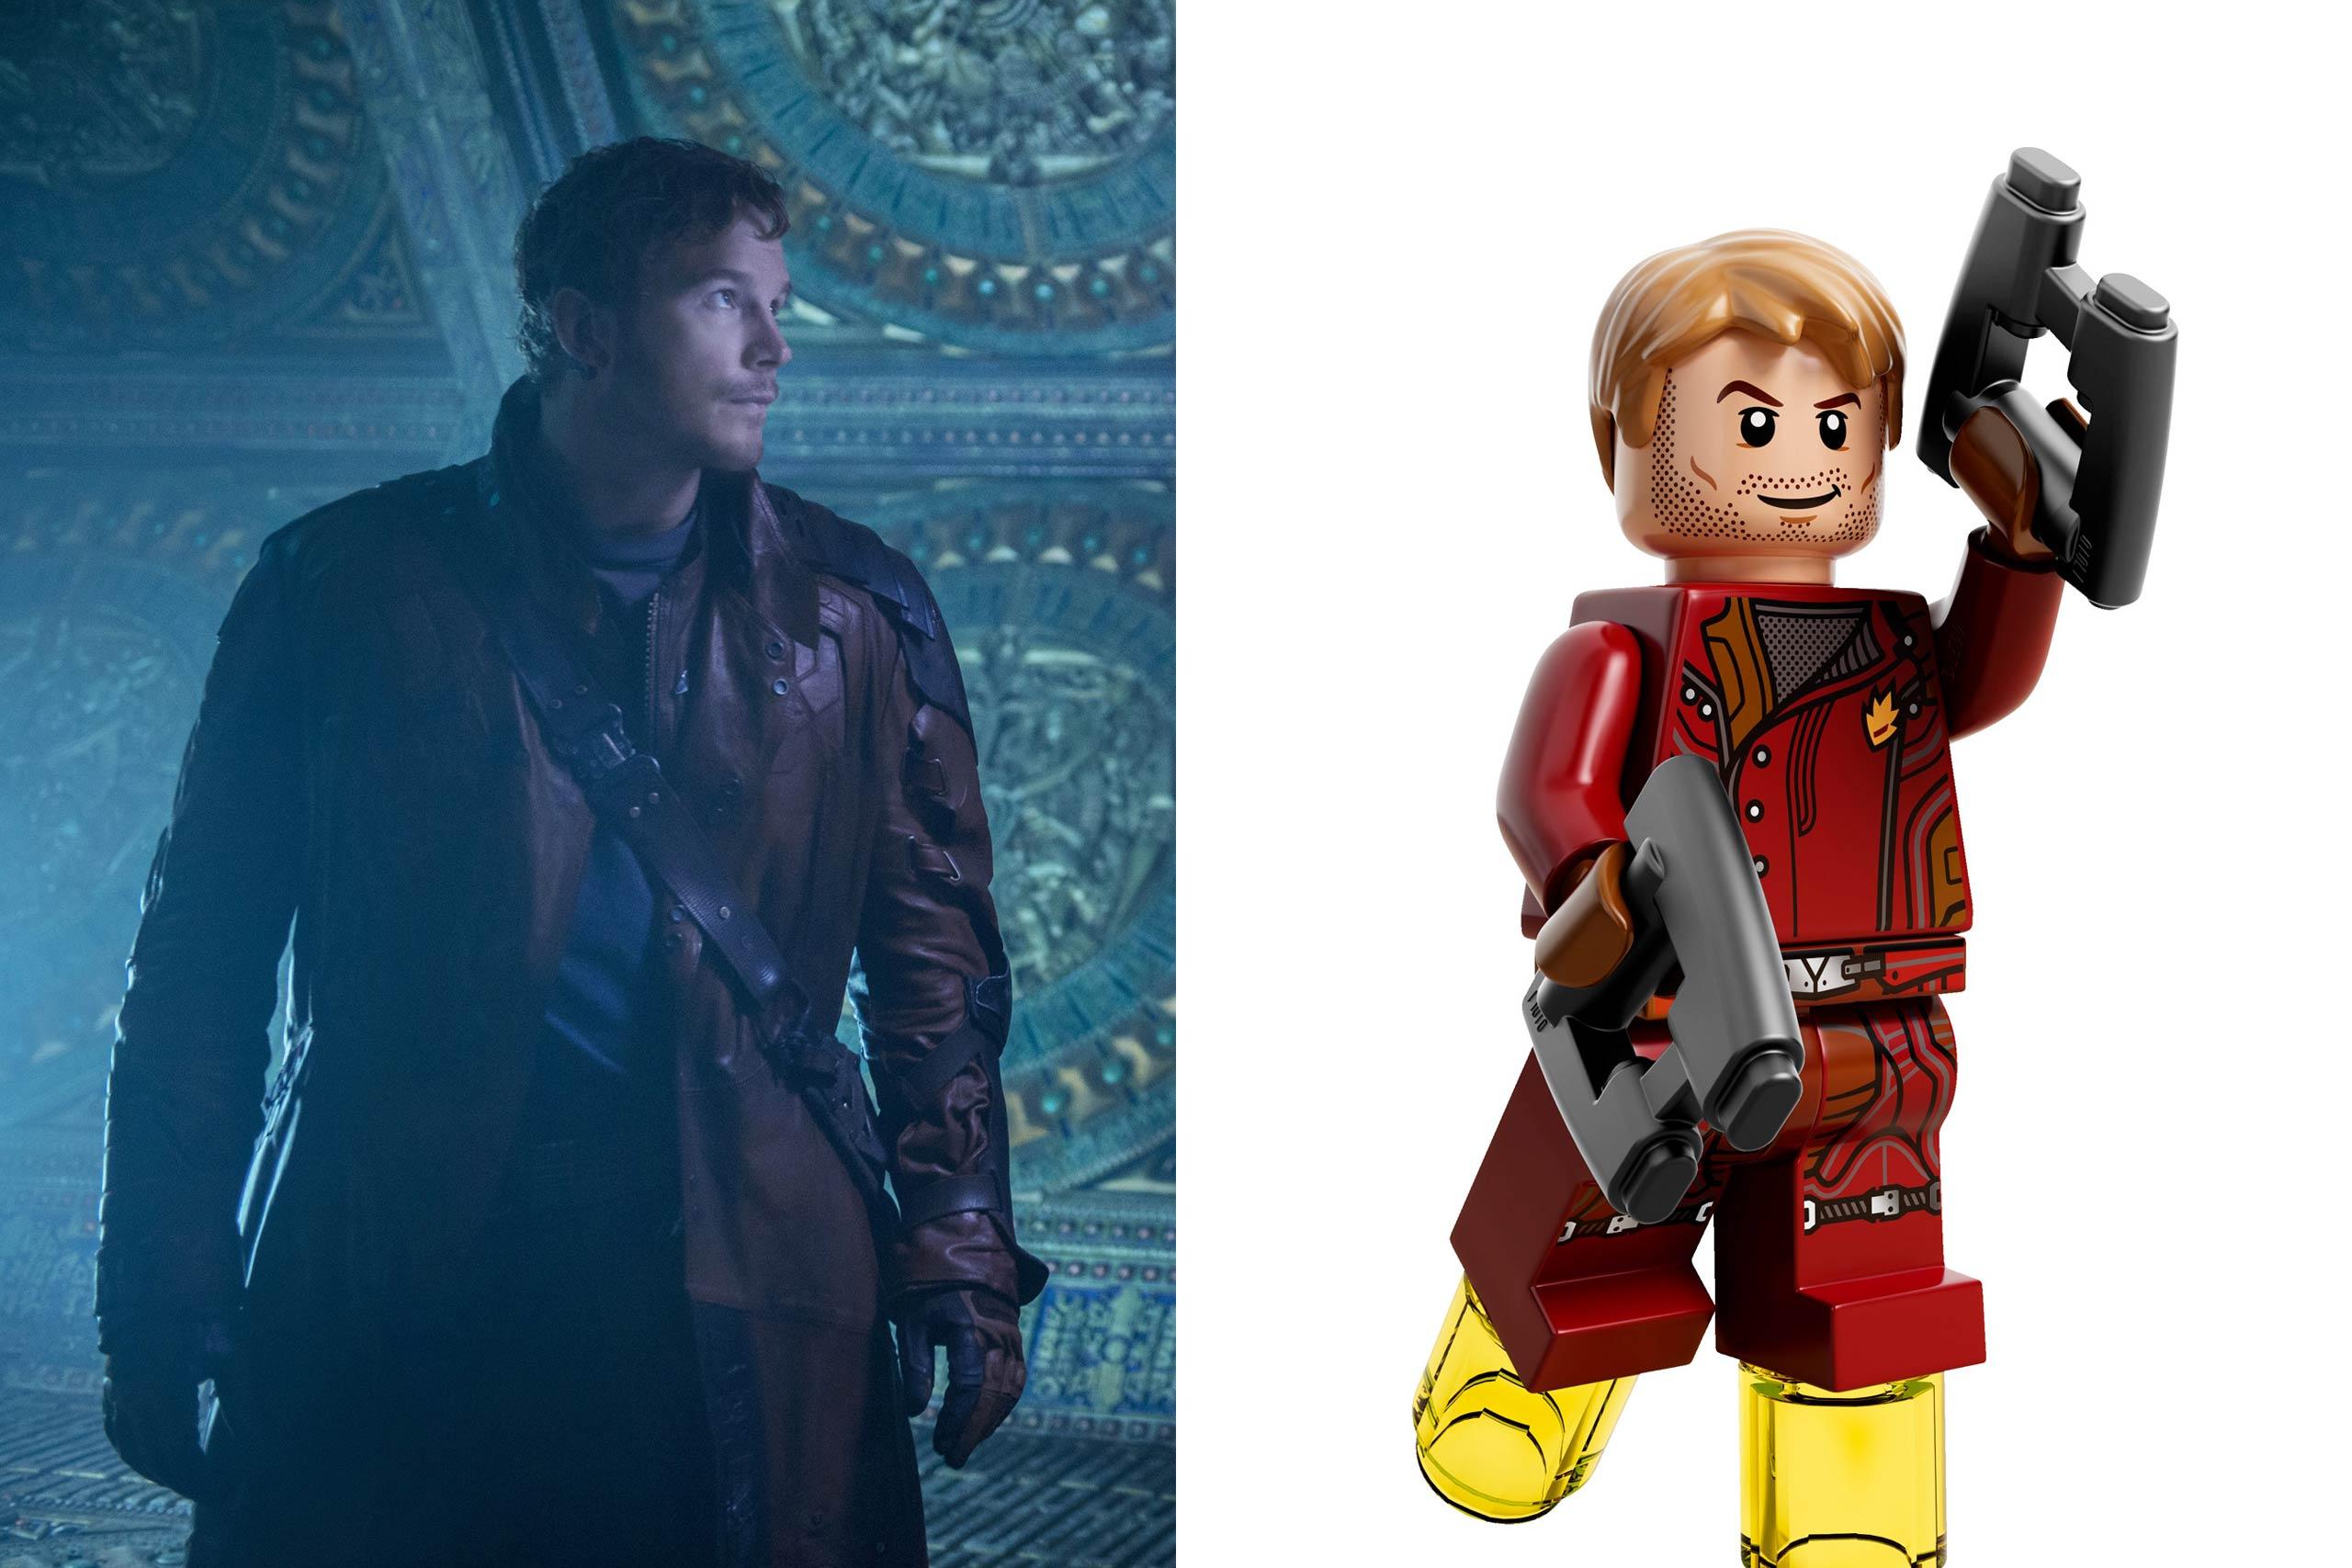 <strong>Chris Pratt: Star Lord</strong>